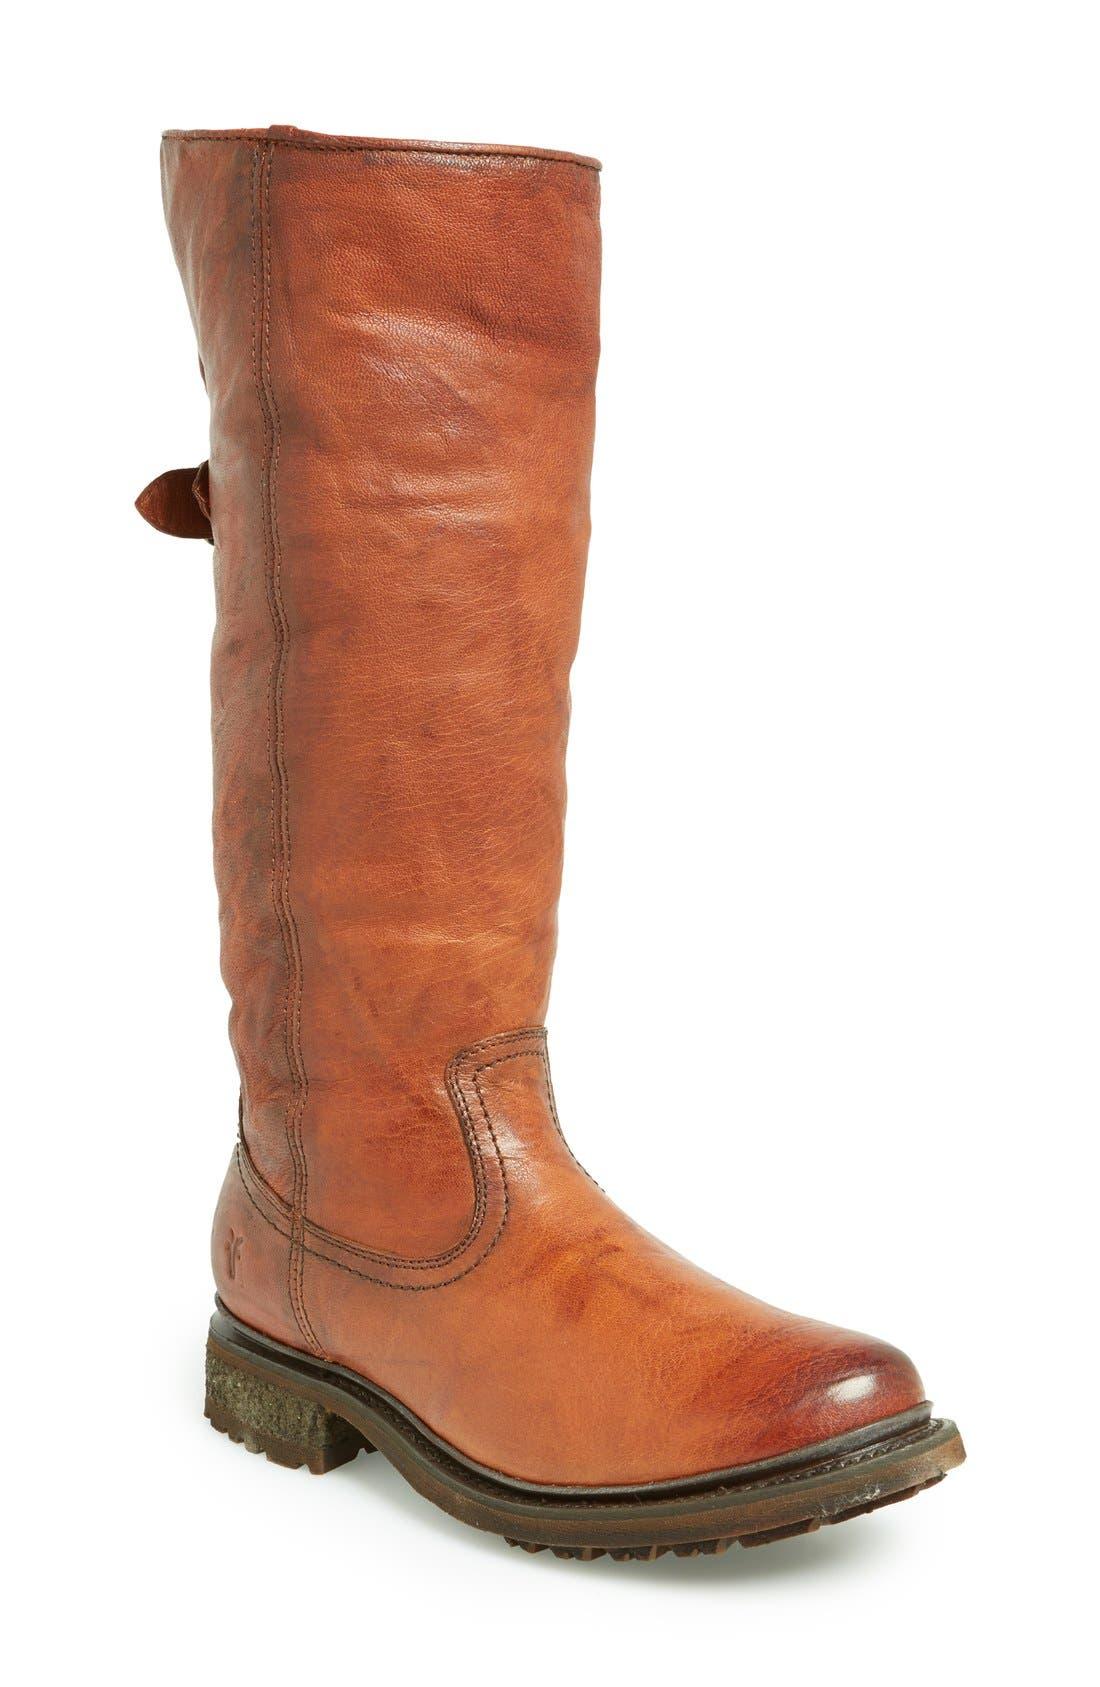 Main Image - Frye 'Valerie' Pull On Shearling Boot (Women)